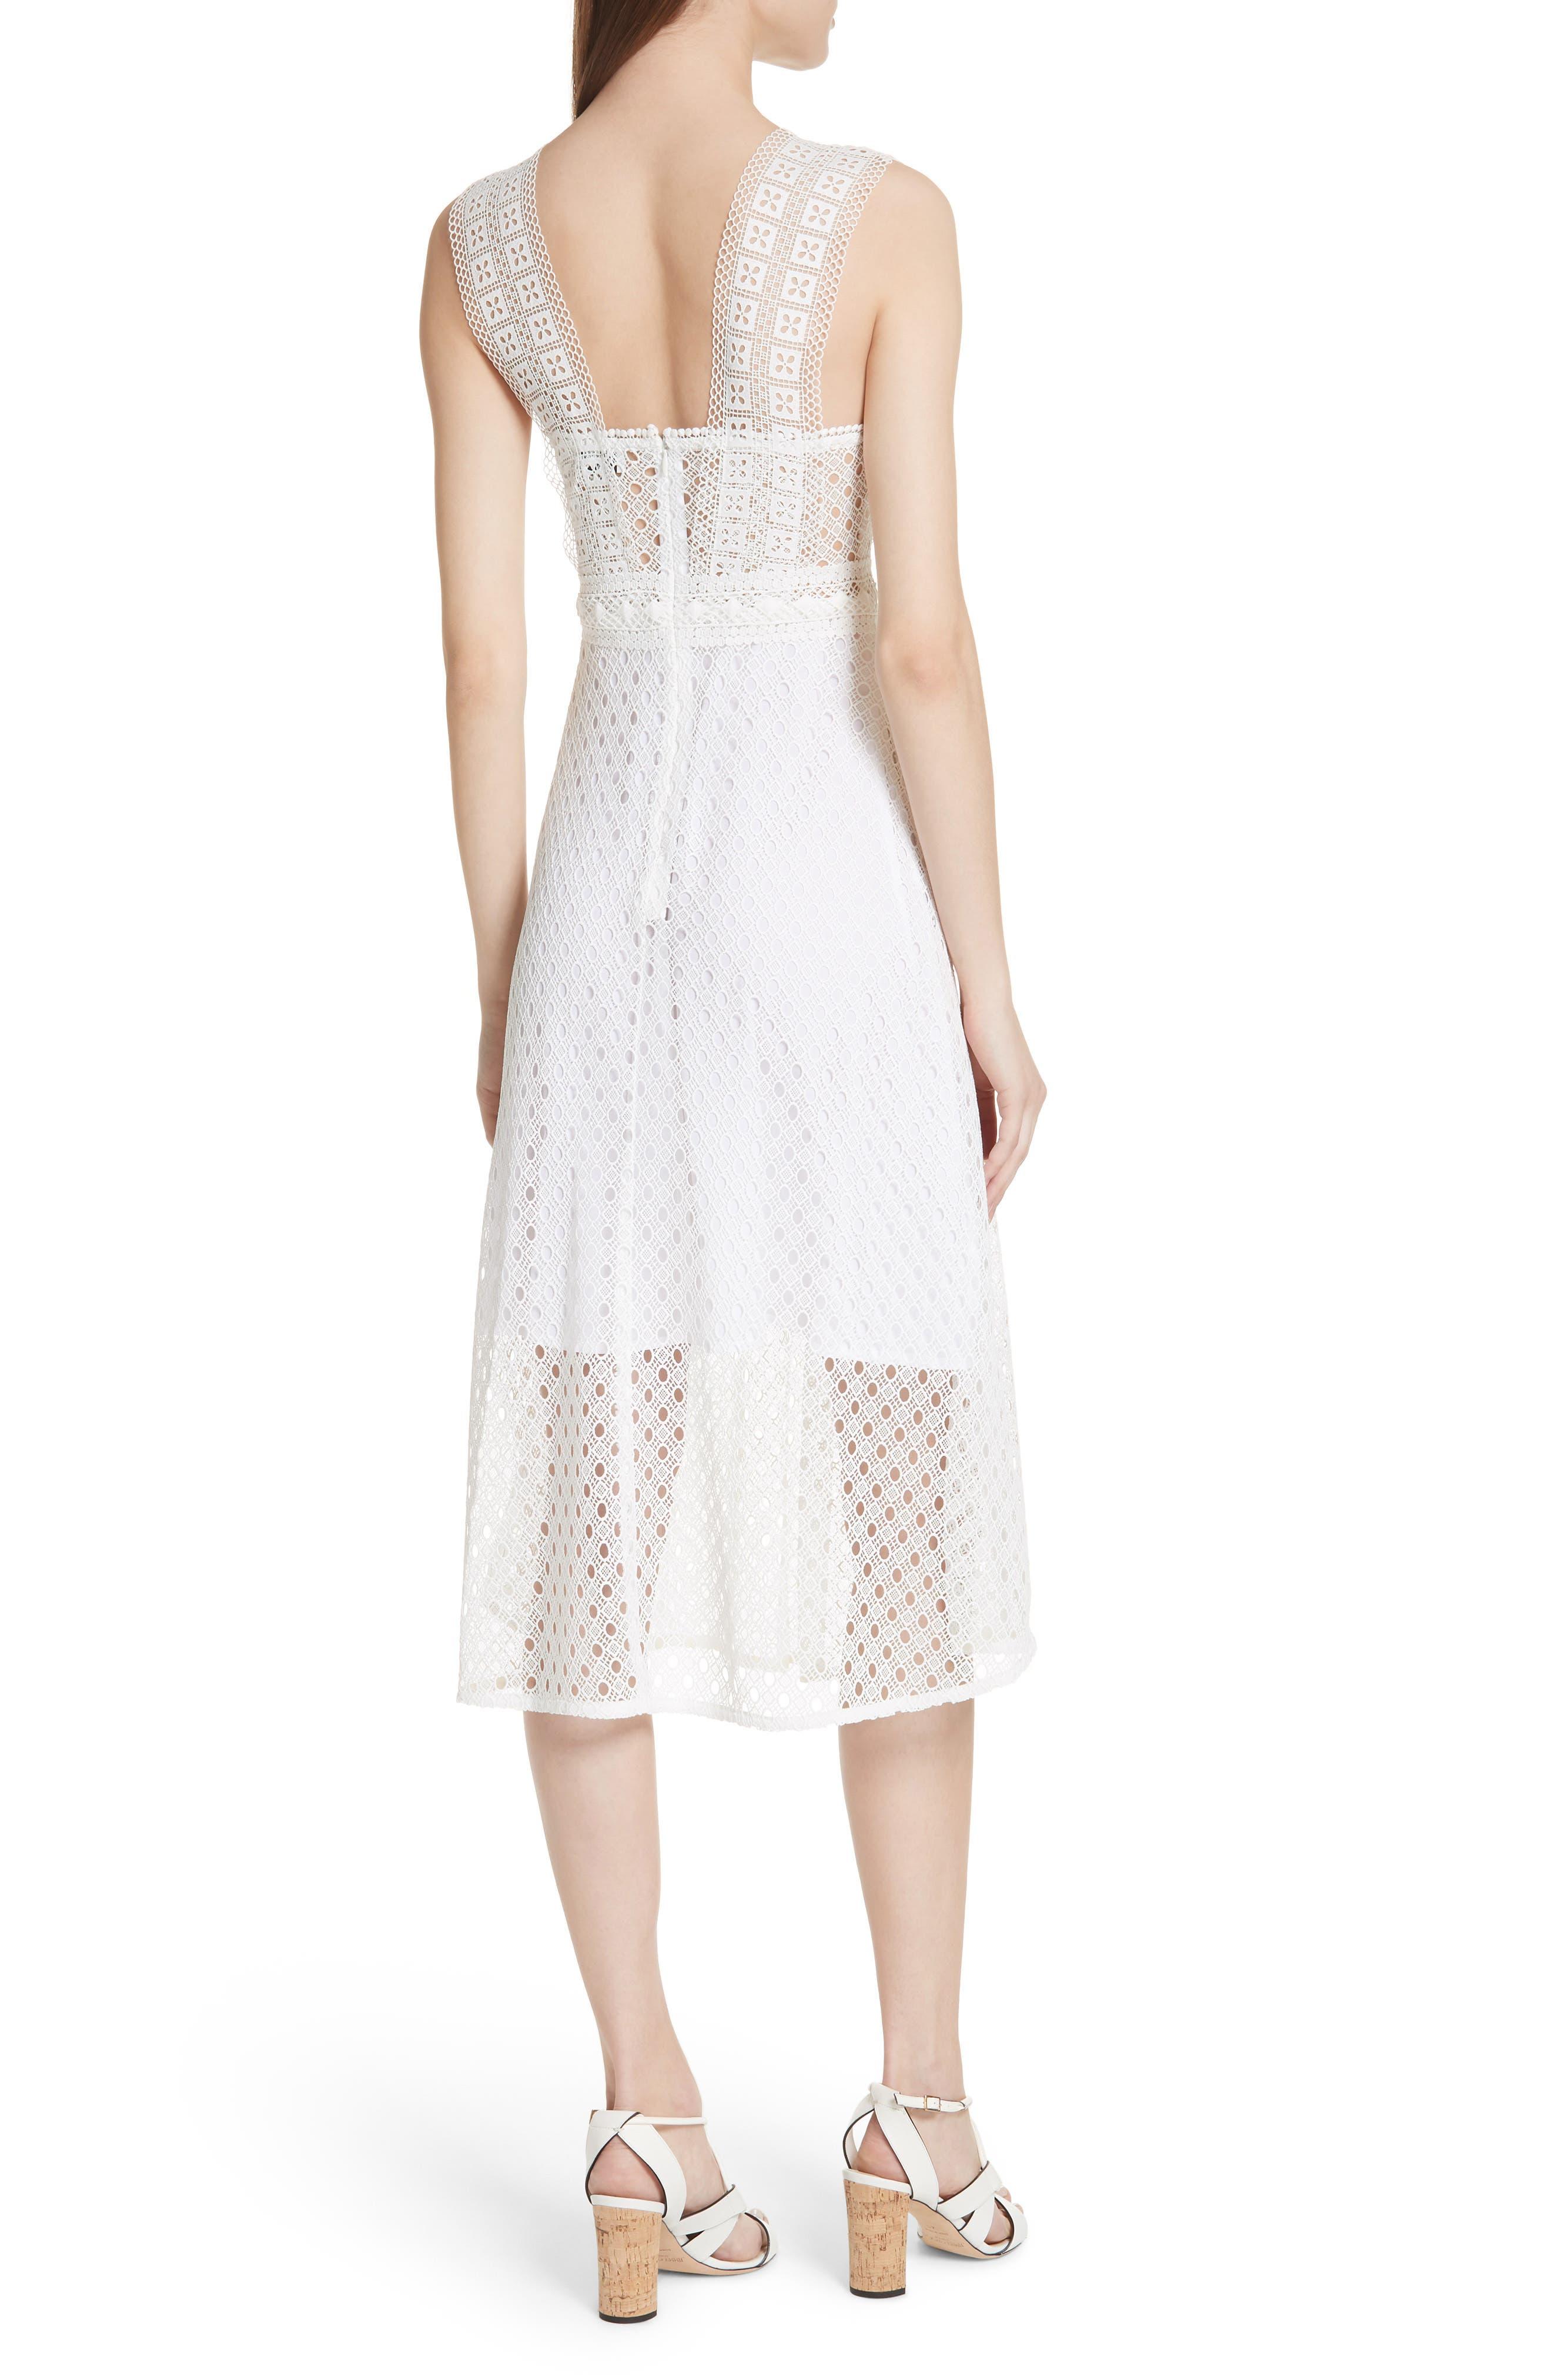 Blanc Lace Square Neck Dress,                             Alternate thumbnail 2, color,                             100